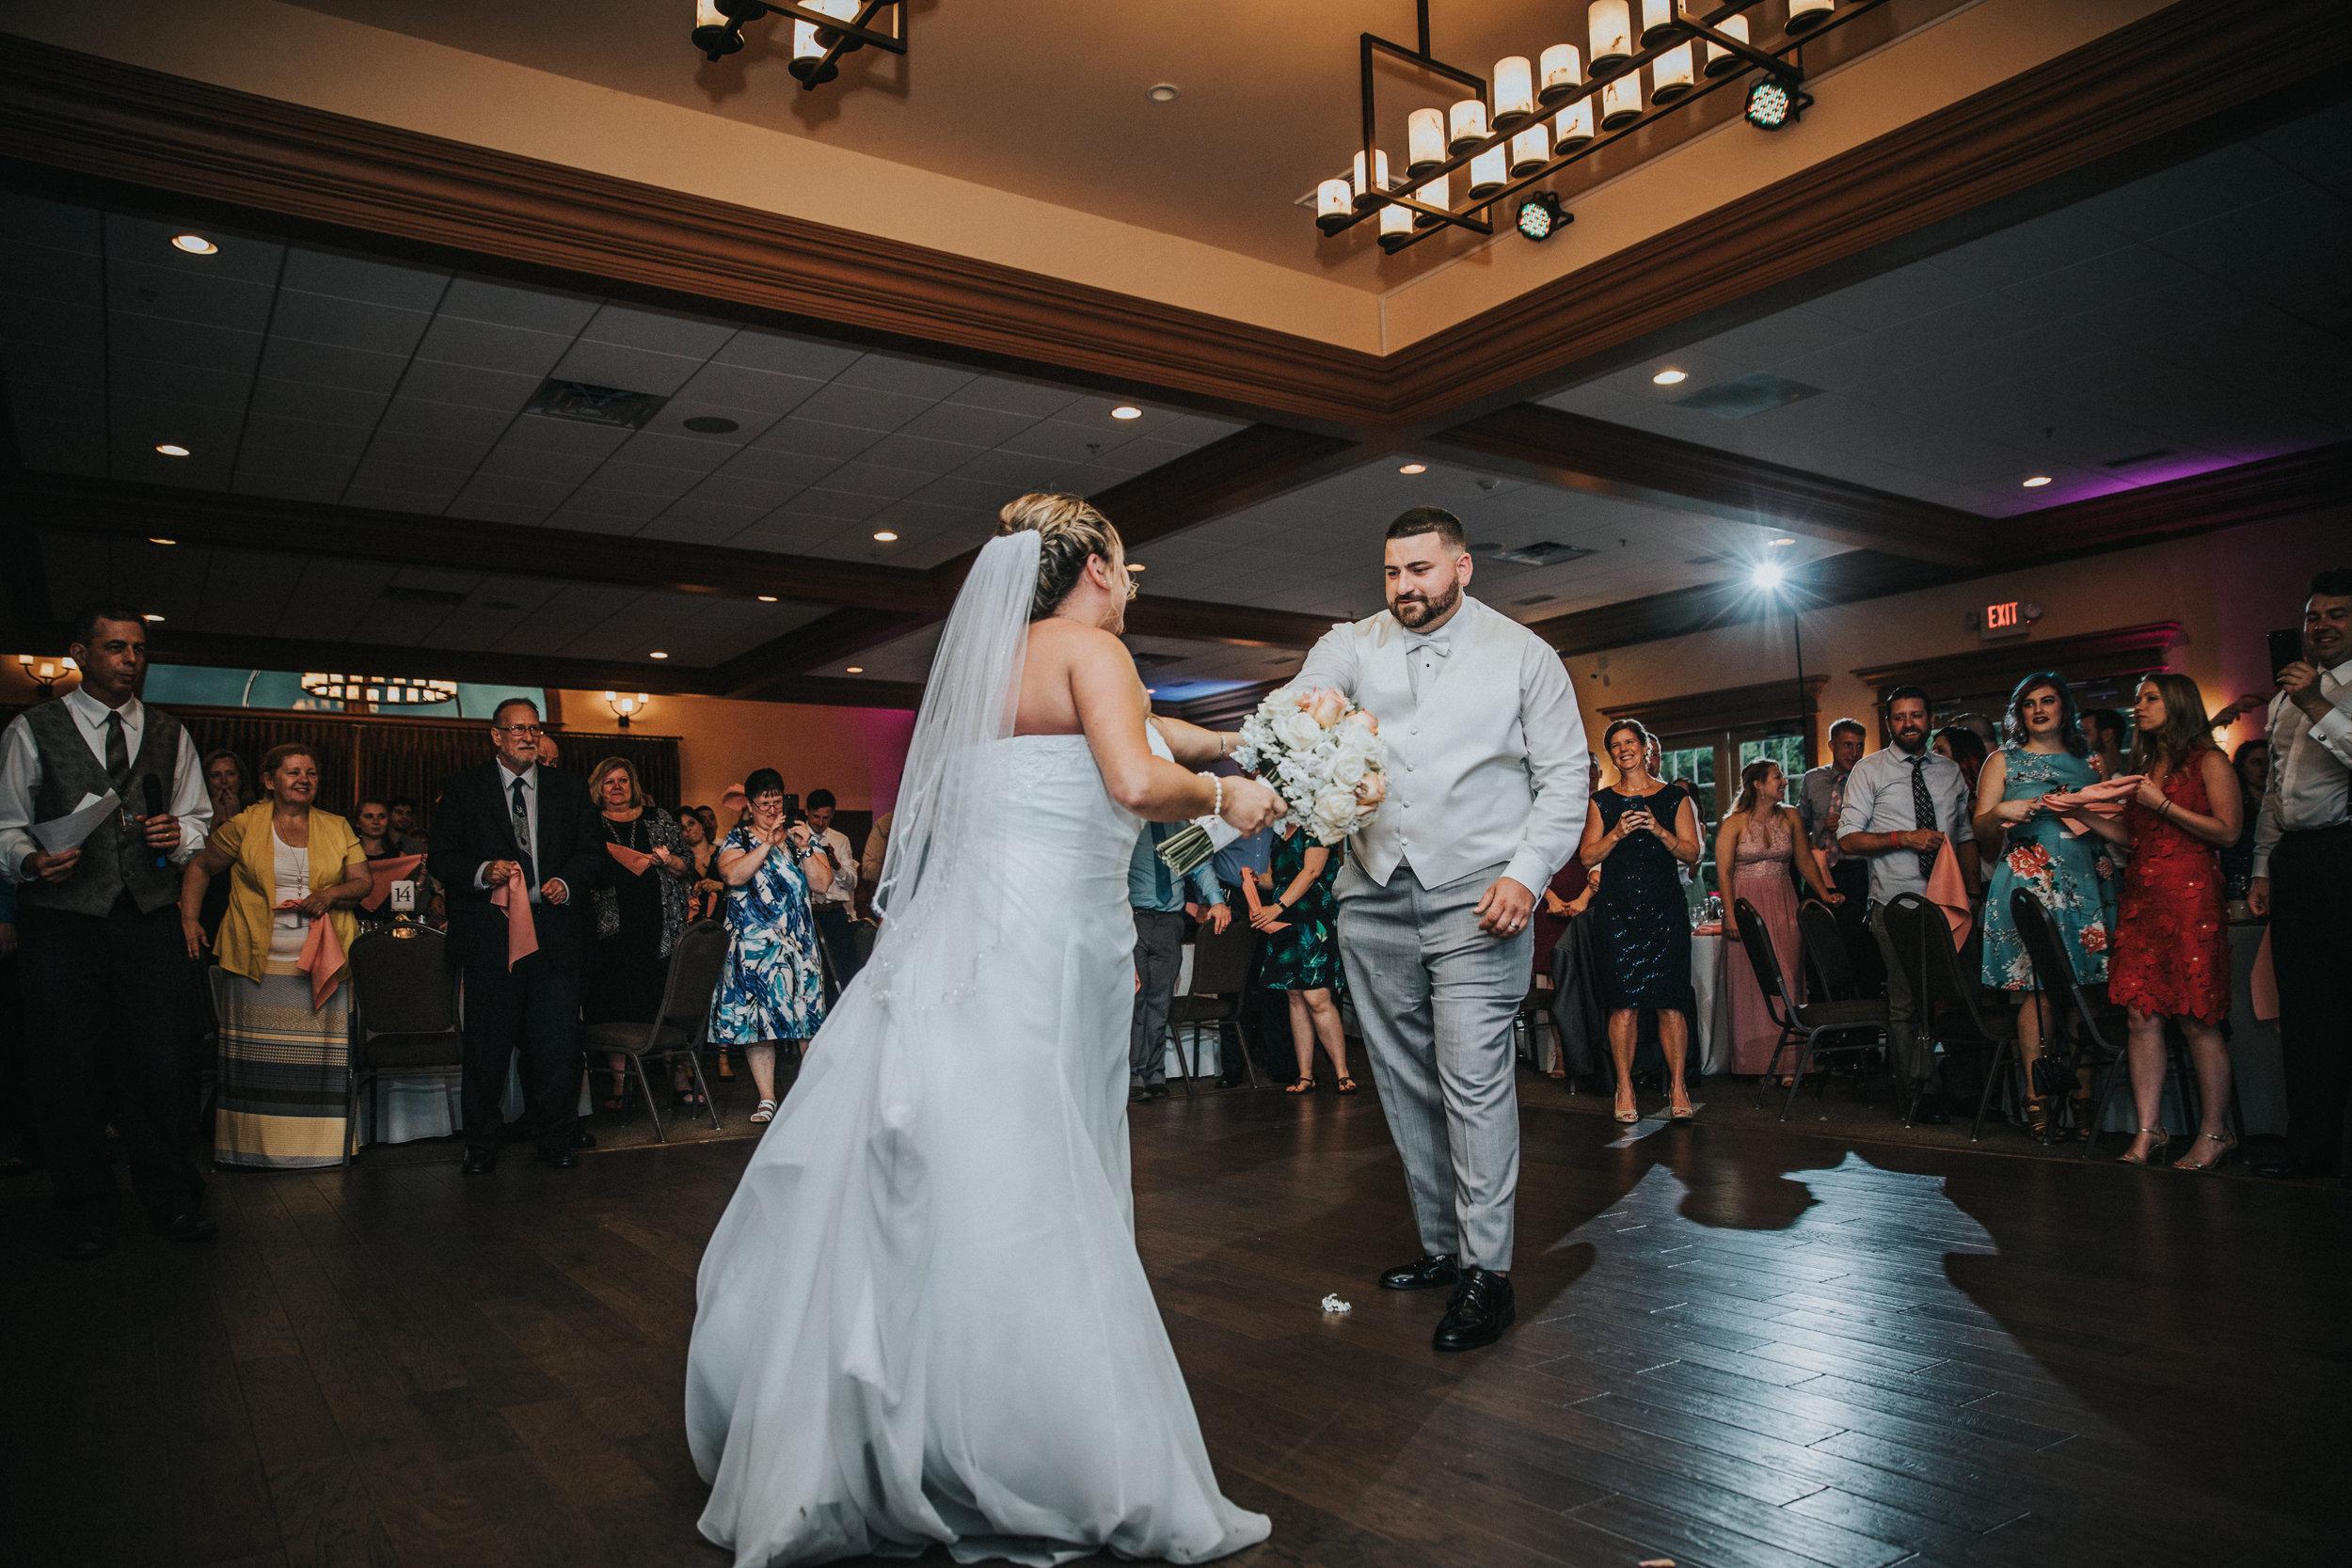 New-Jersey-Wedding-Photographer-JennaLynnPhotography-ValenzanoWinery-Reception-38.jpg